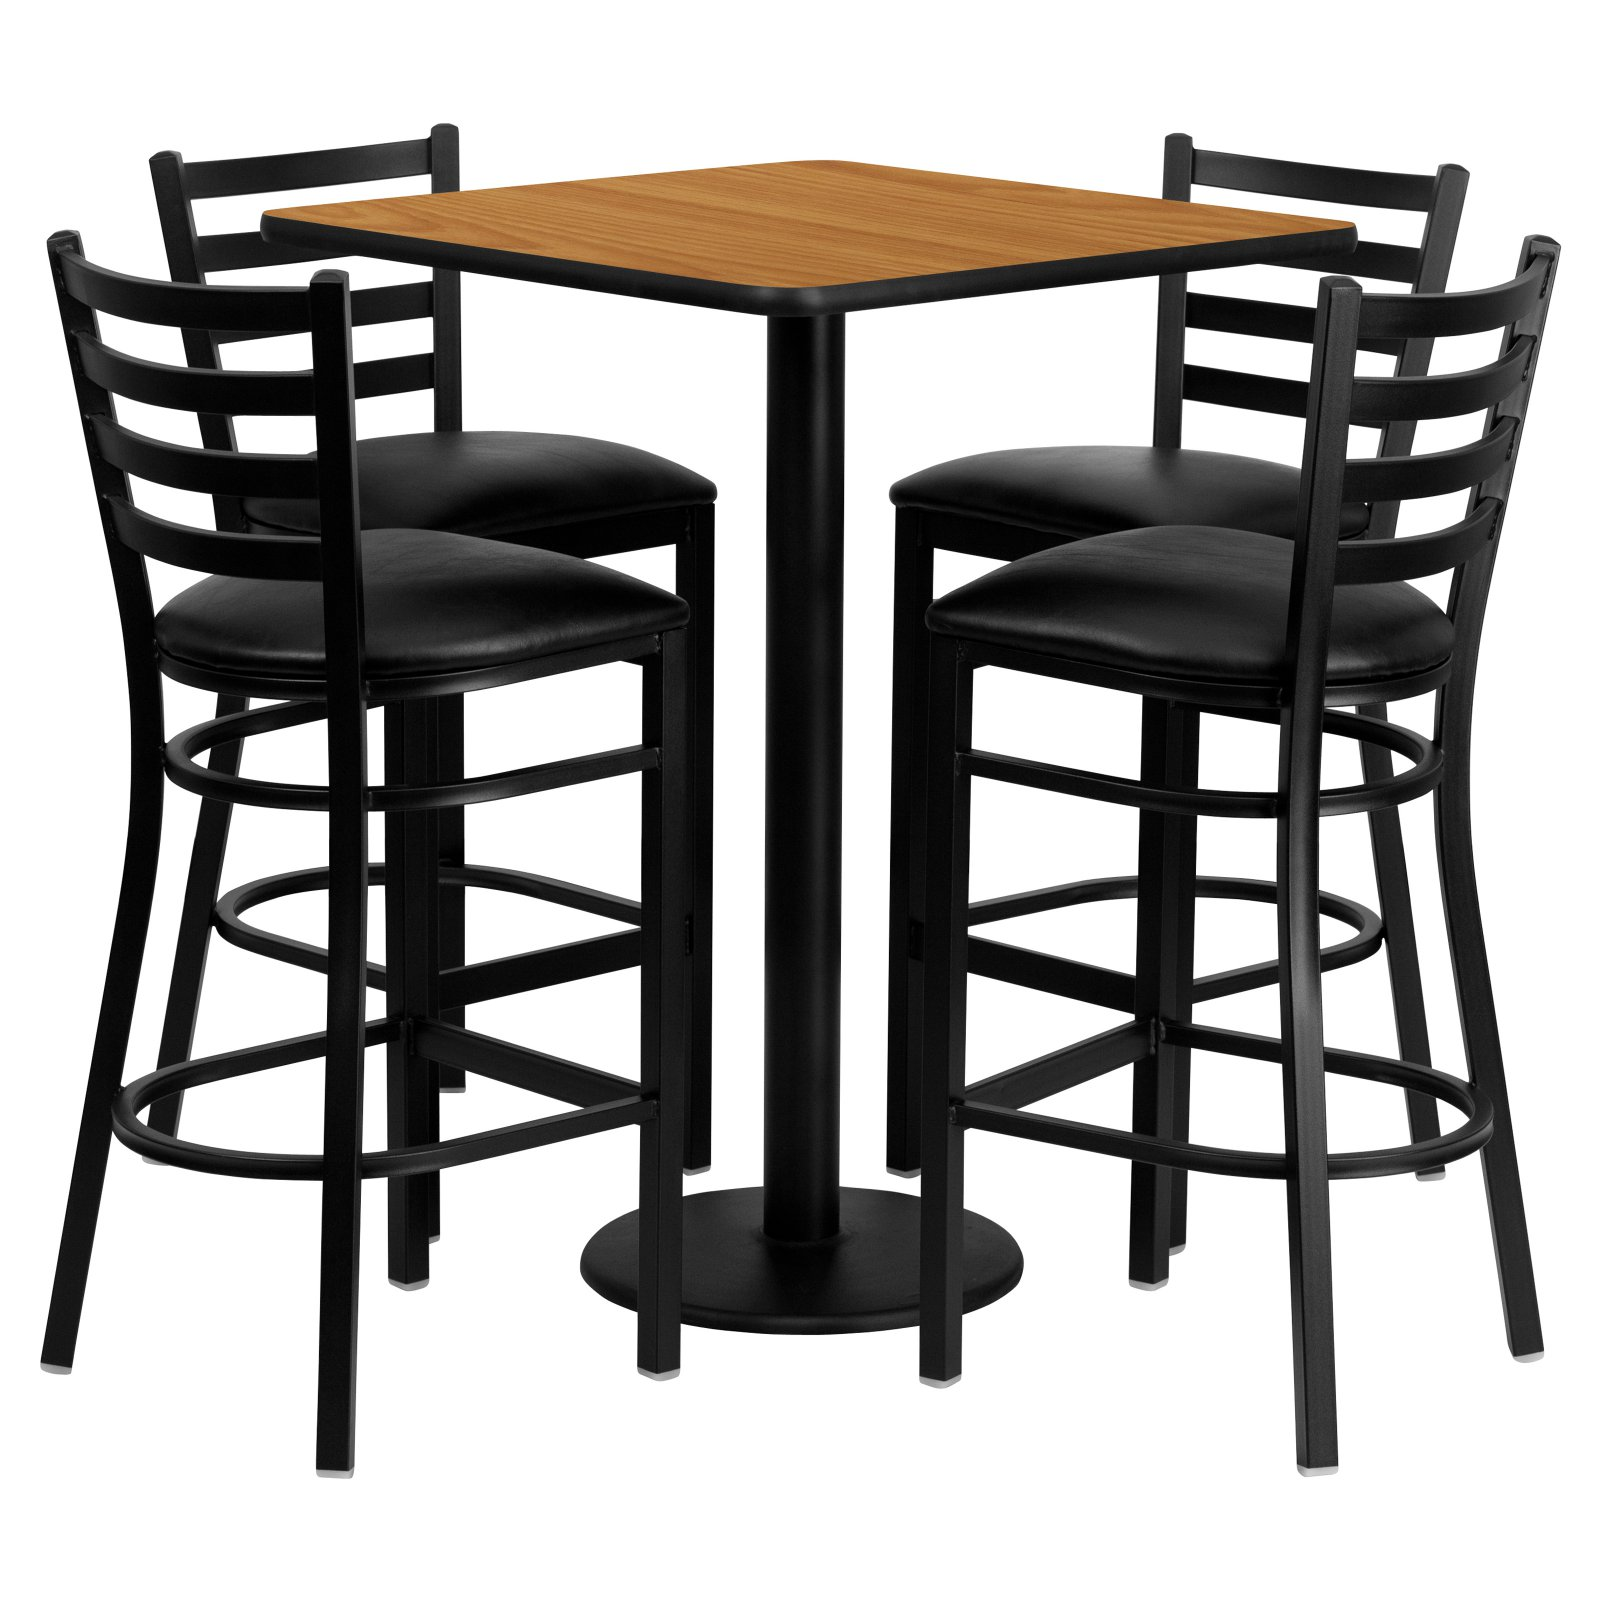 Flash Furniture 30'' Square Natural Laminate Table Set with 4 Ladder Back Metal Barstools, Black Vinyl Seat